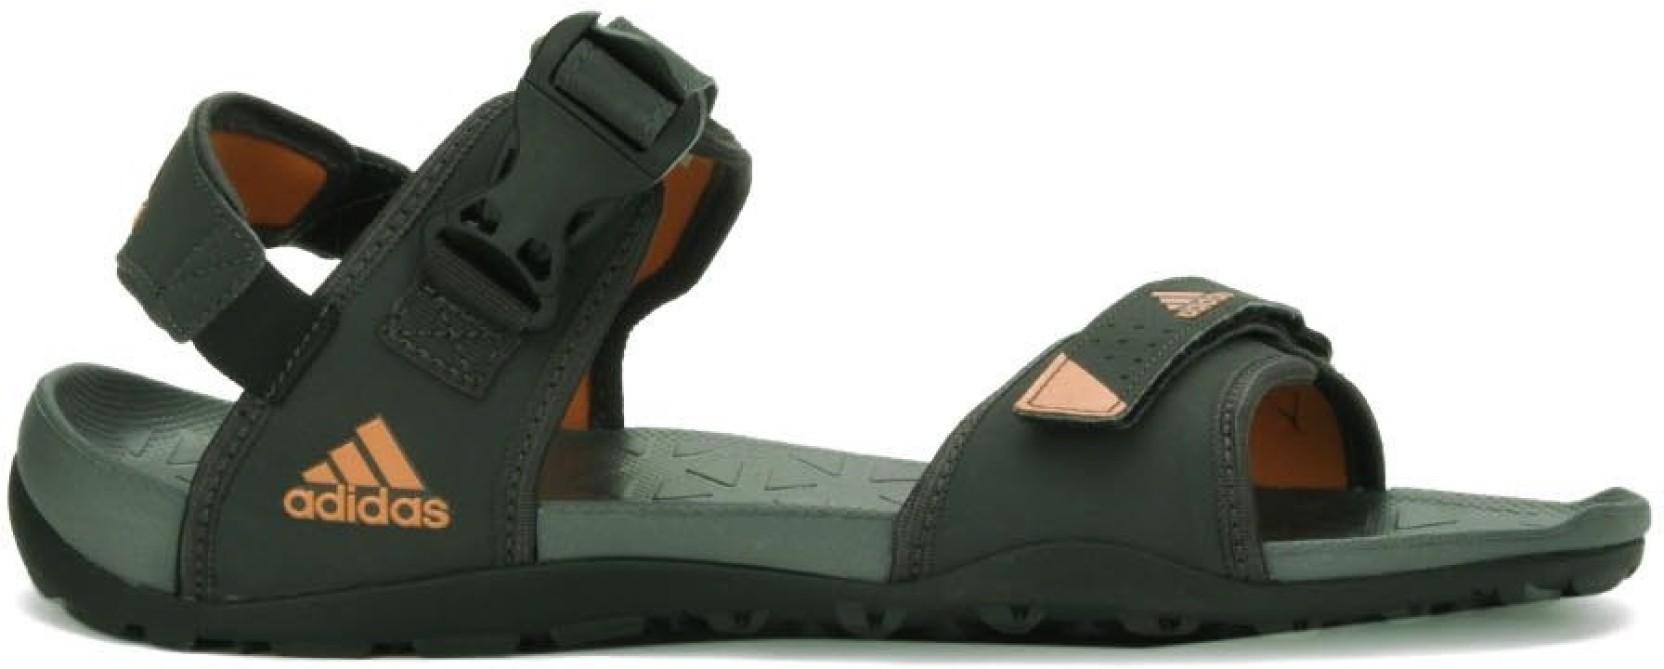 1d25e4391c52 ADIDAS Men Grey.Orange Sports Sandals - Buy UTIBLK UNIORA BLACK ...